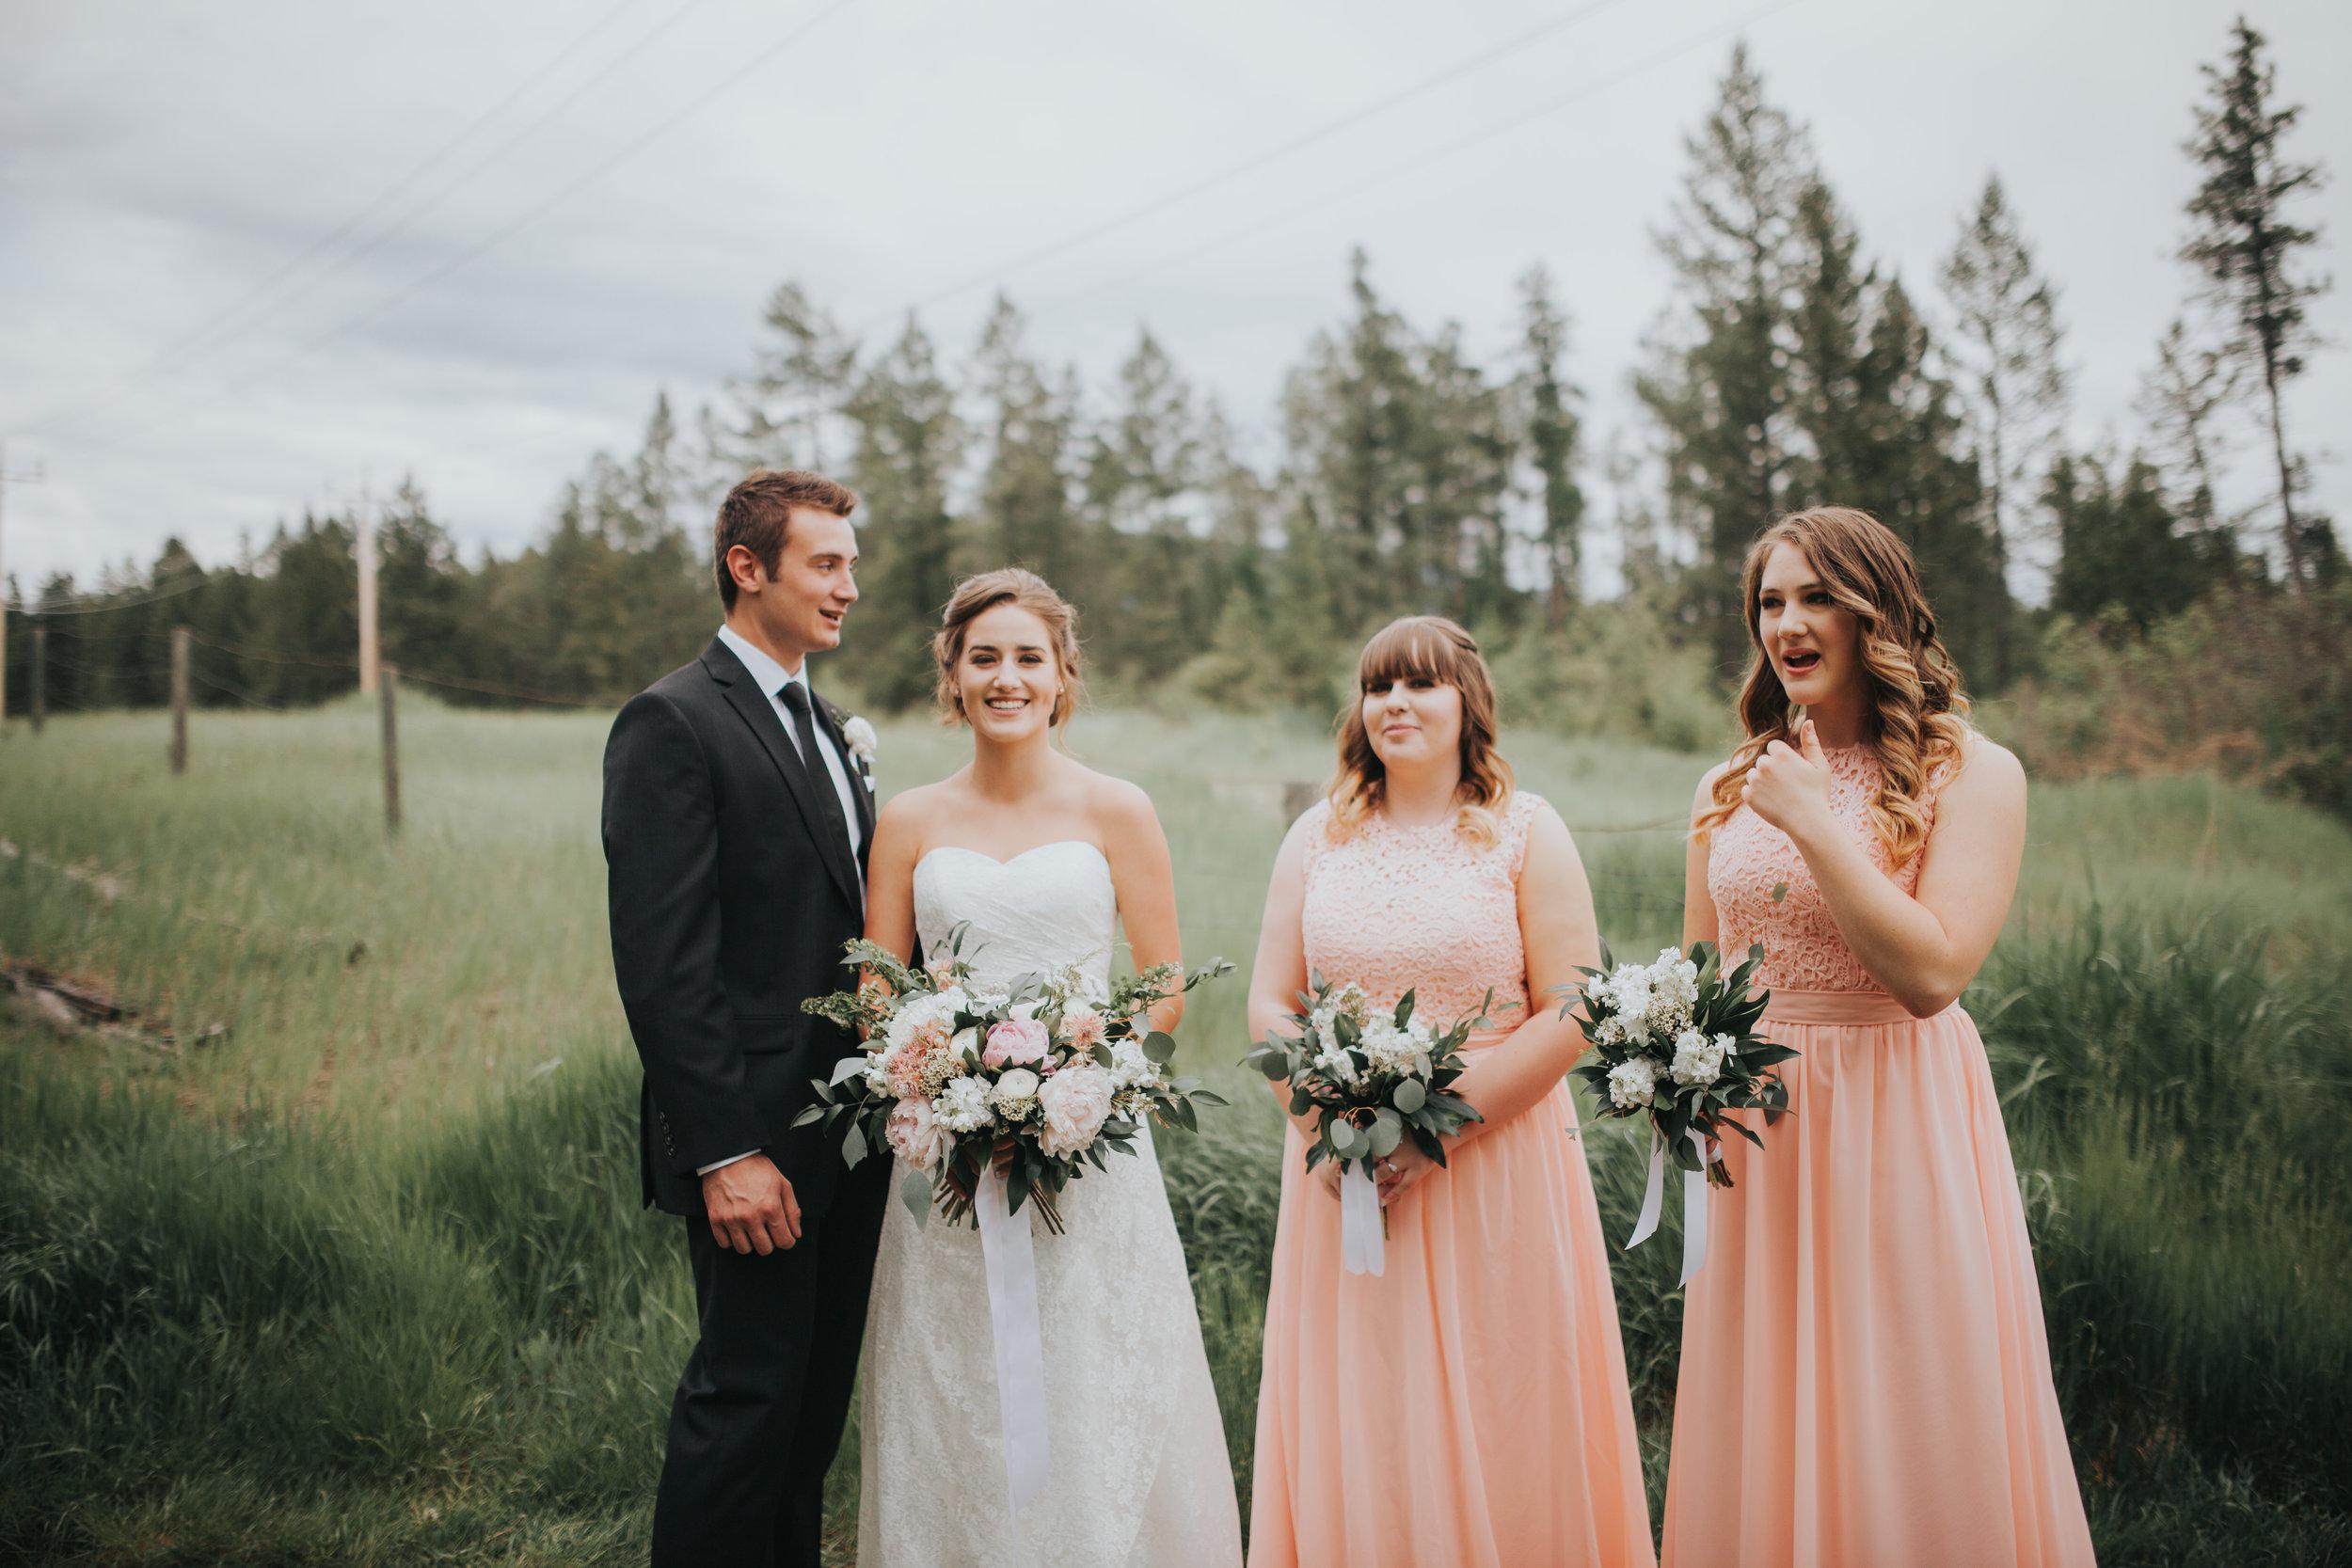 Ryter 4 - Bridal Portraits-24.jpg